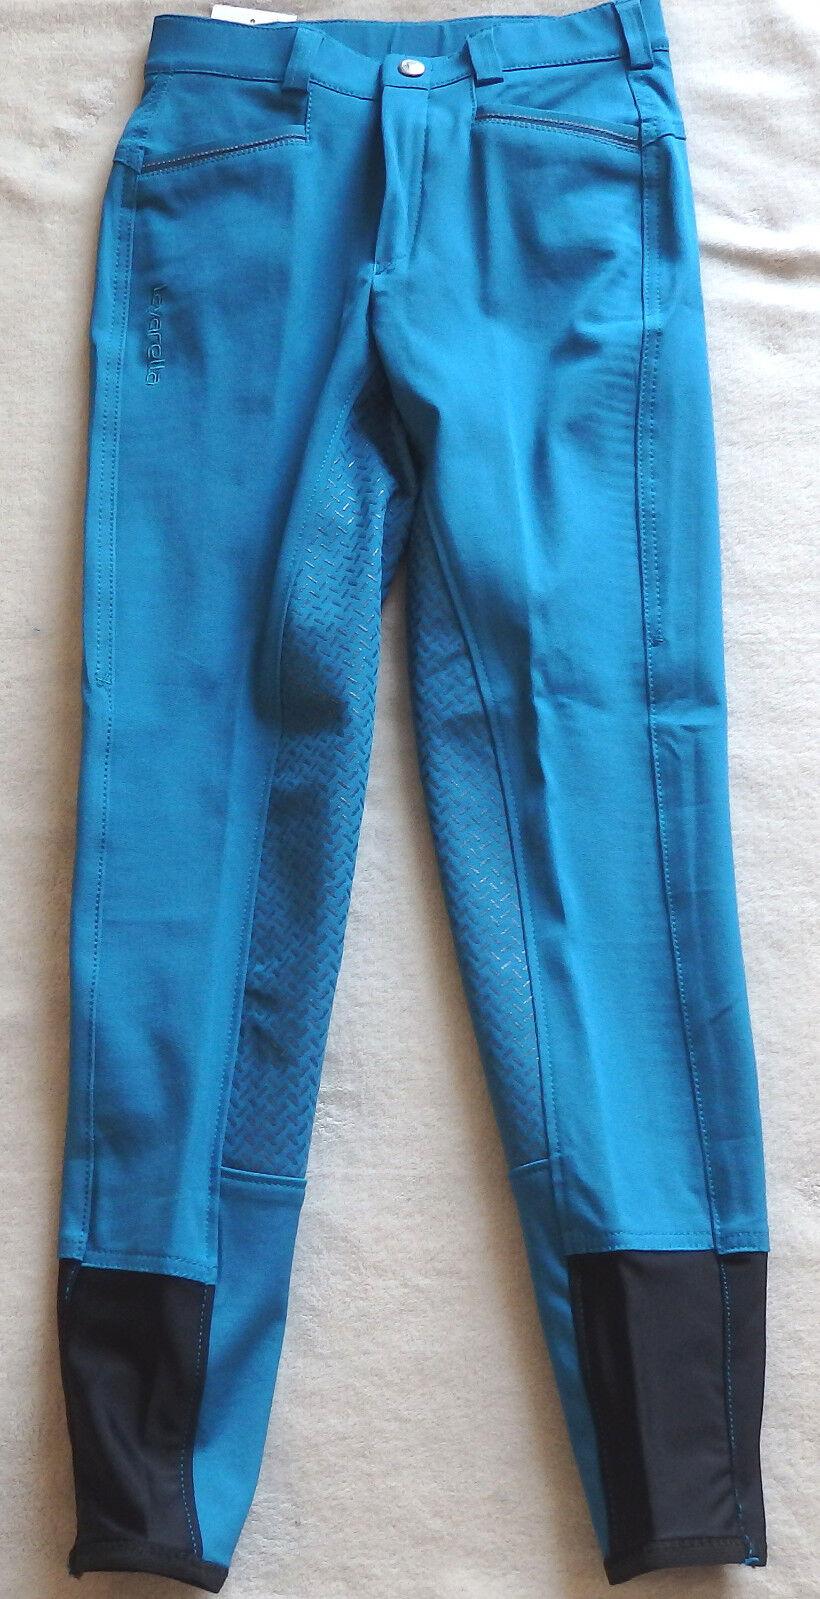 Kinder Reithose  mit Gripvollbesatz ,royal blue,Gr.158 ,lavarella  (18)